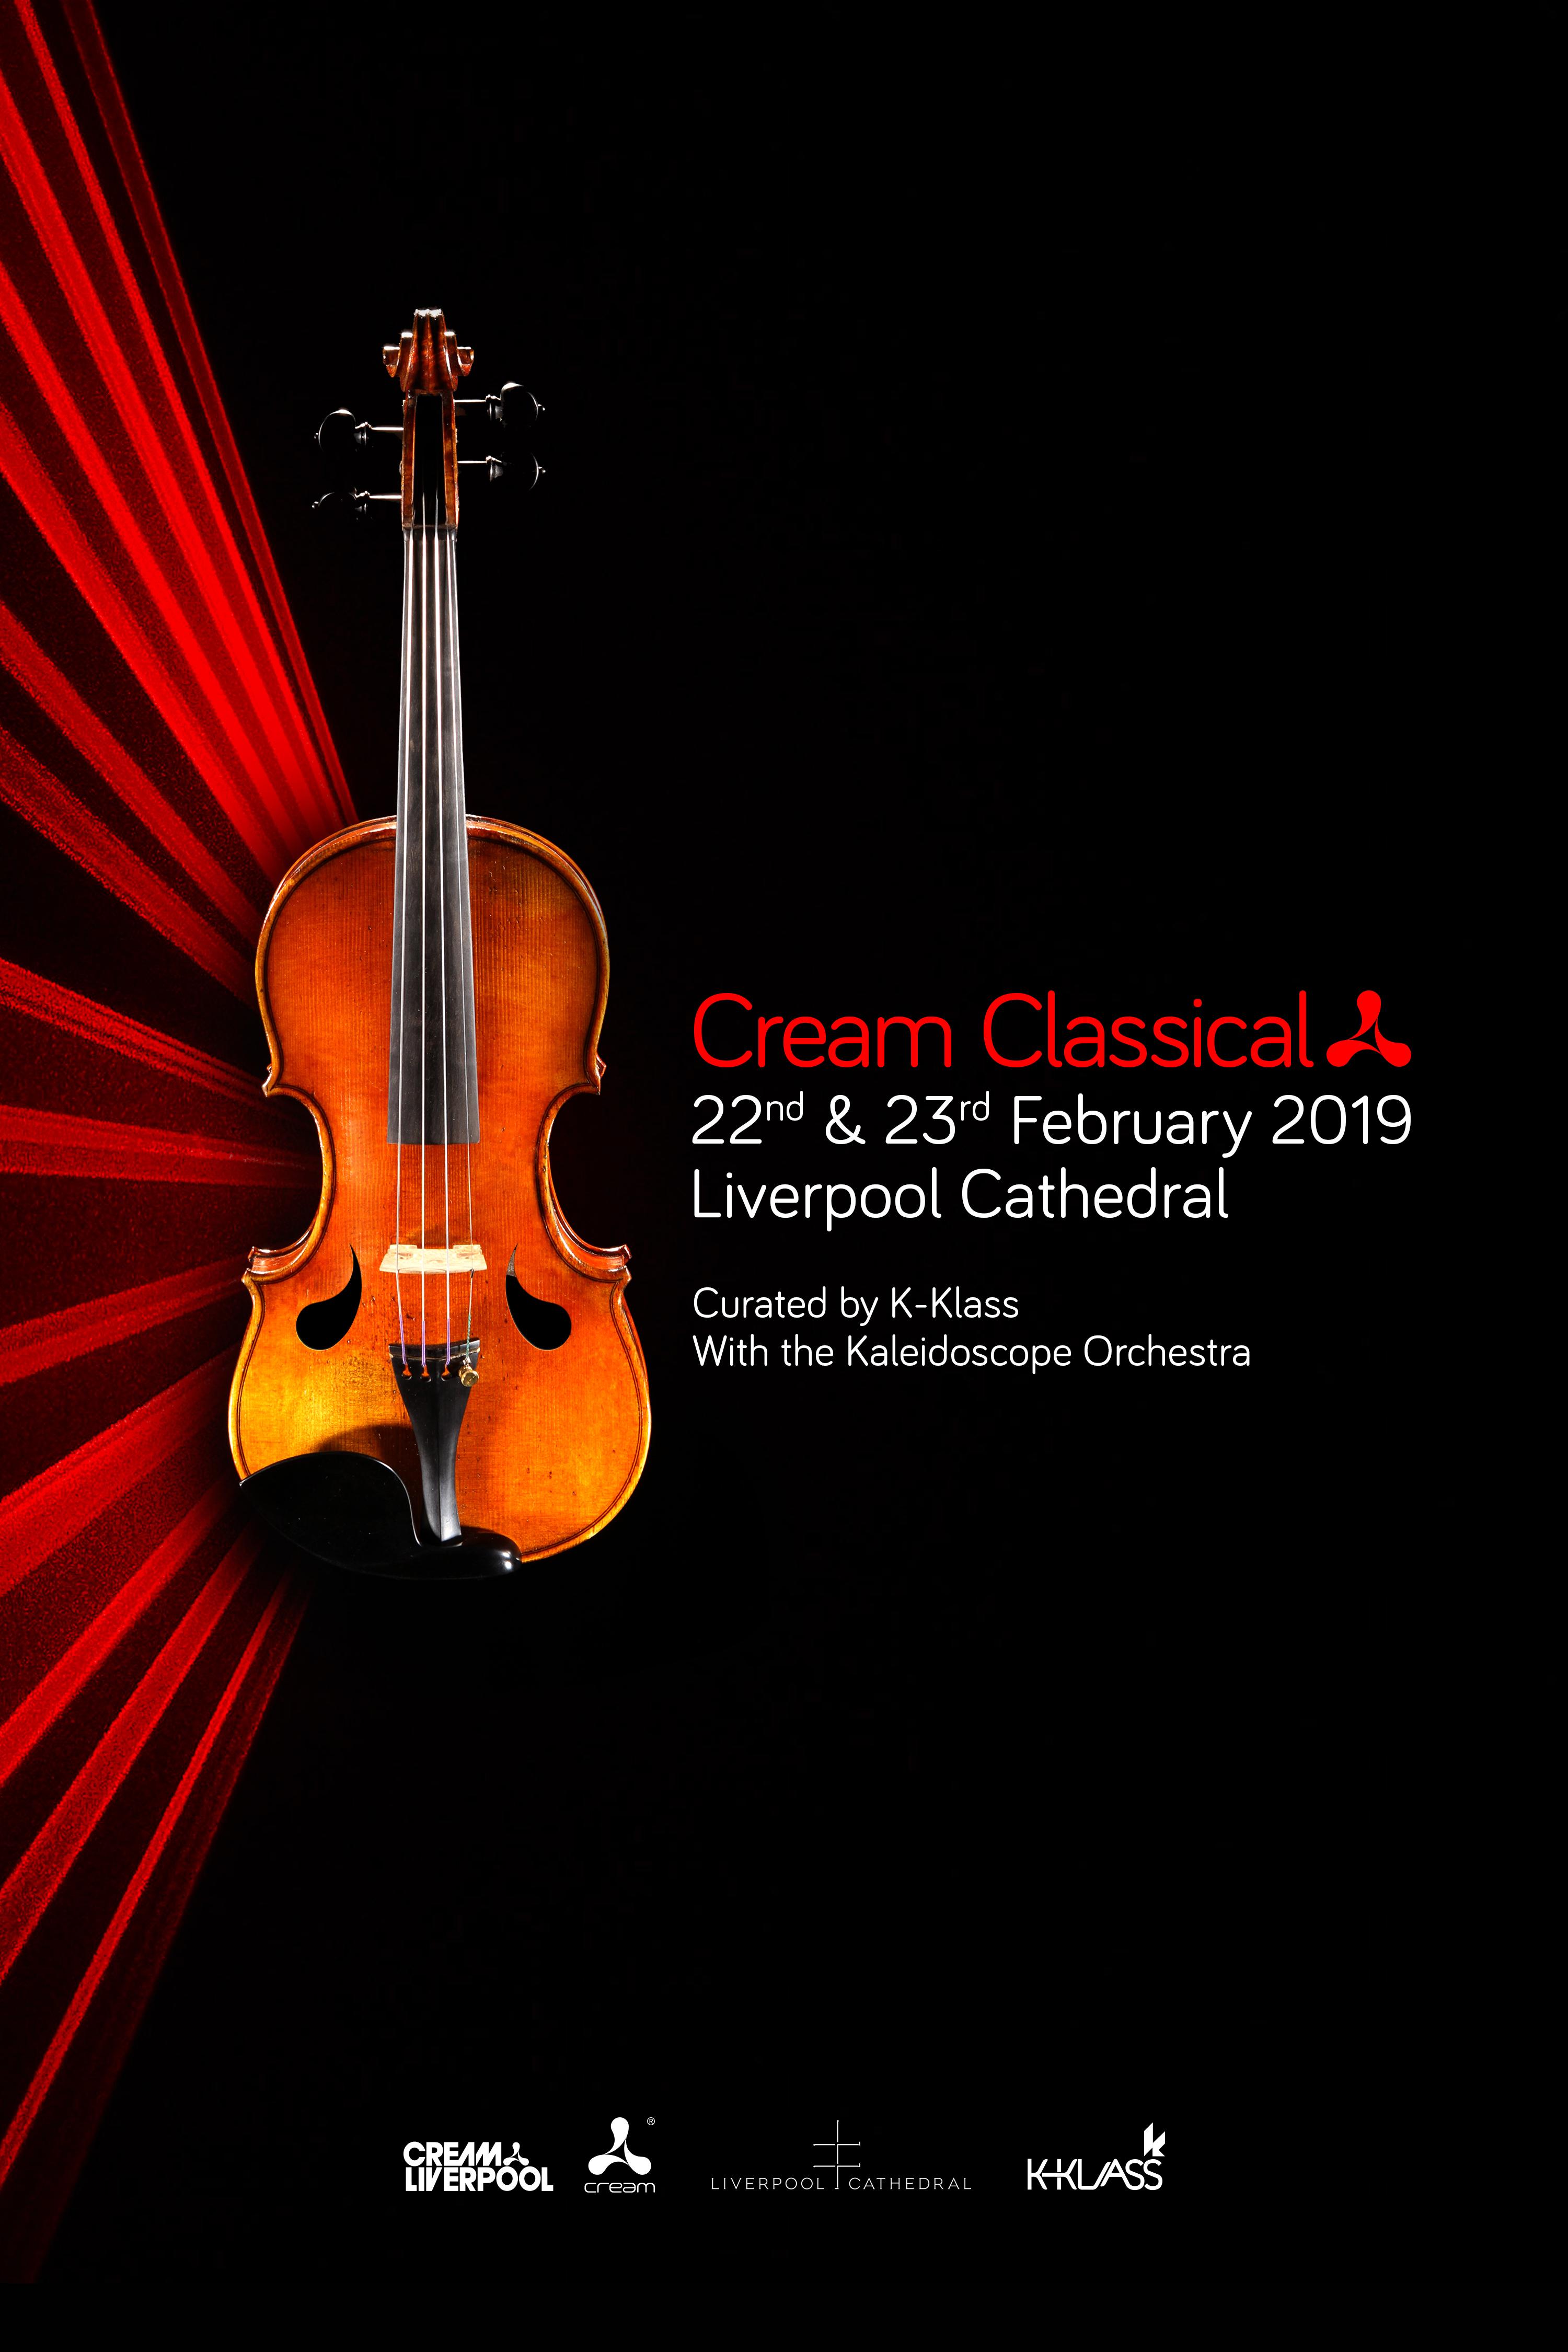 creamclassicalfeb2019_poster.jpg